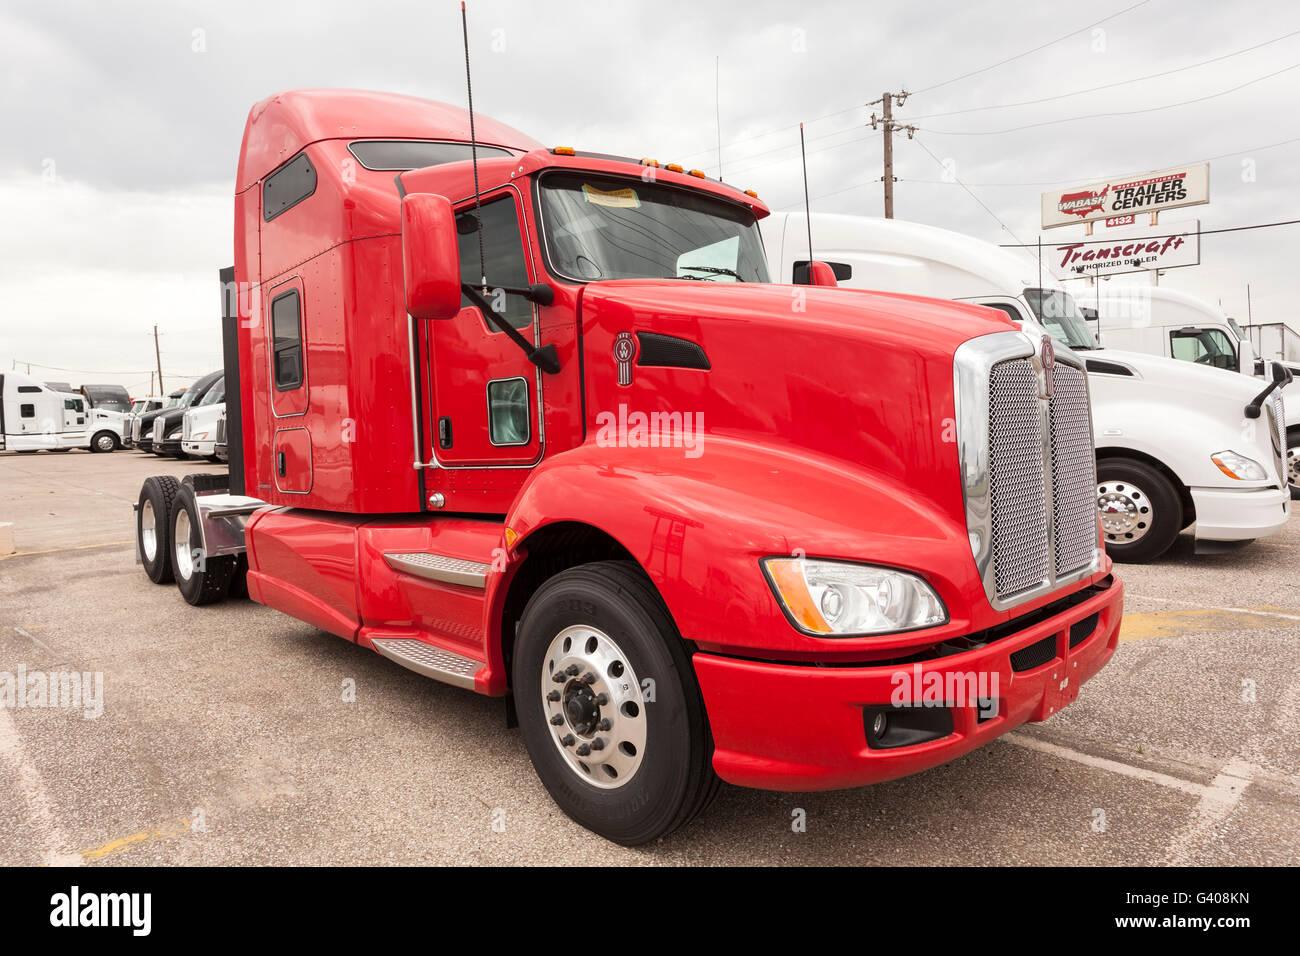 New Kenworth T680 Truck - Stock Image